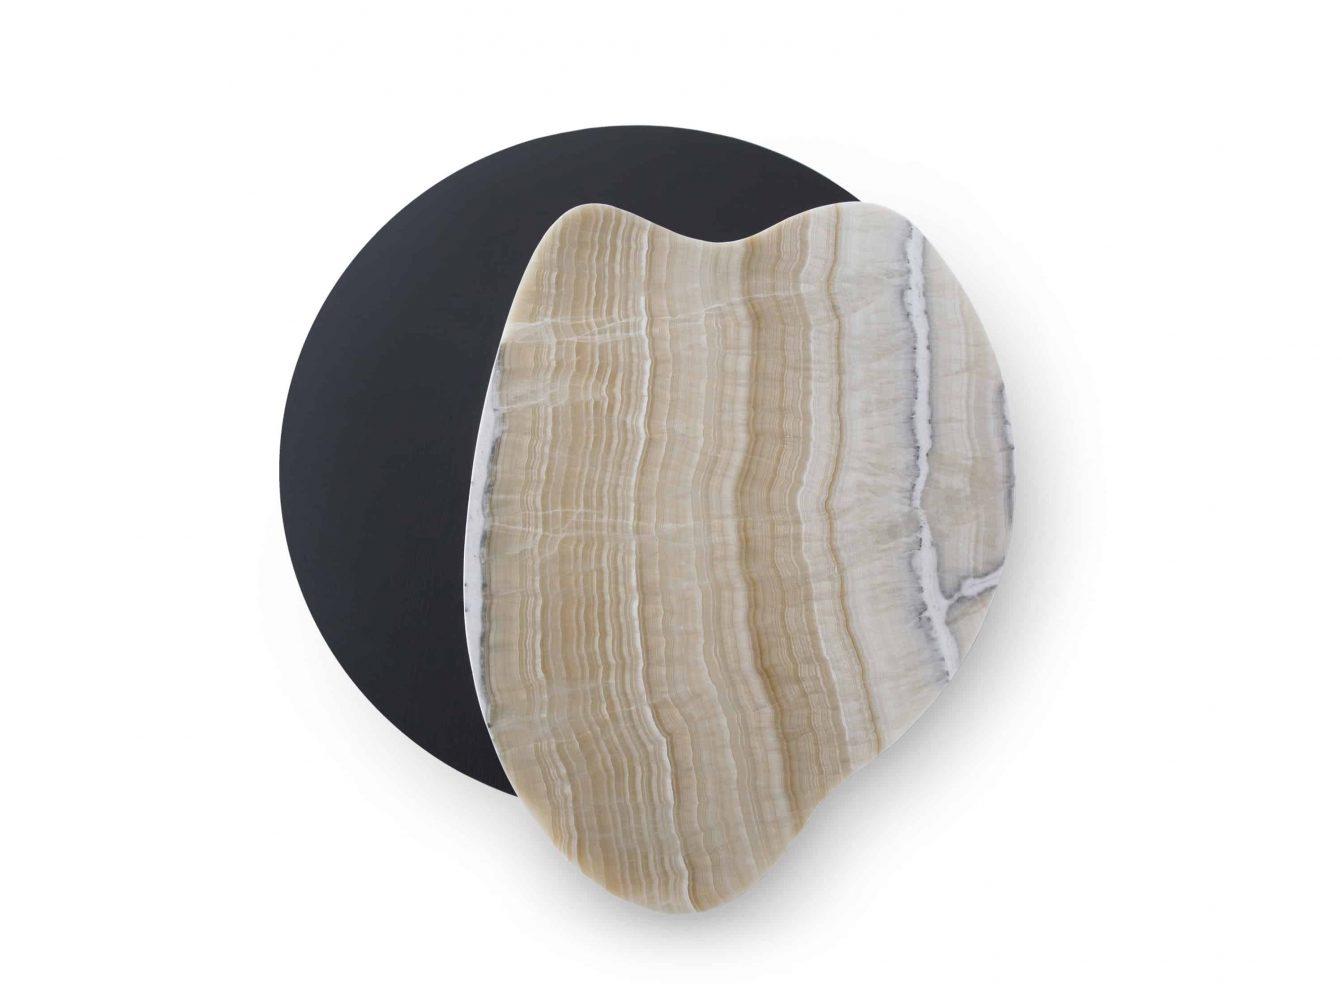 Greenapple Bordeira Low Table